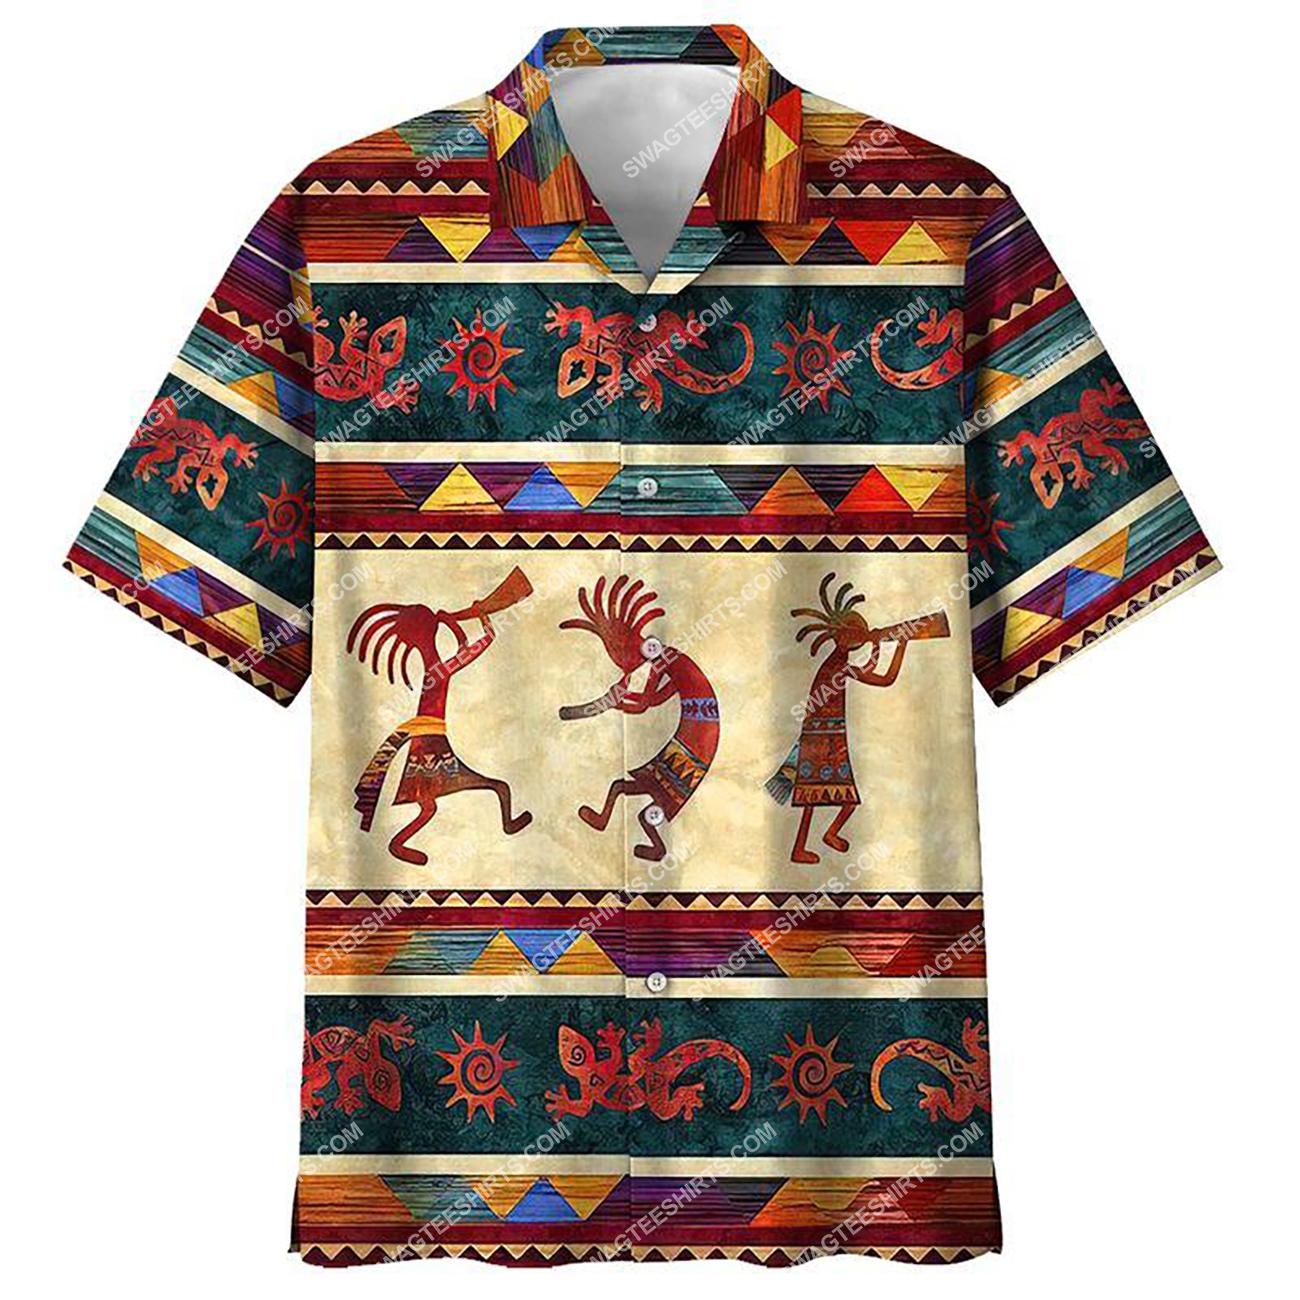 vintage native american culture all over printed hawaiian shirt 1(3) - Copy